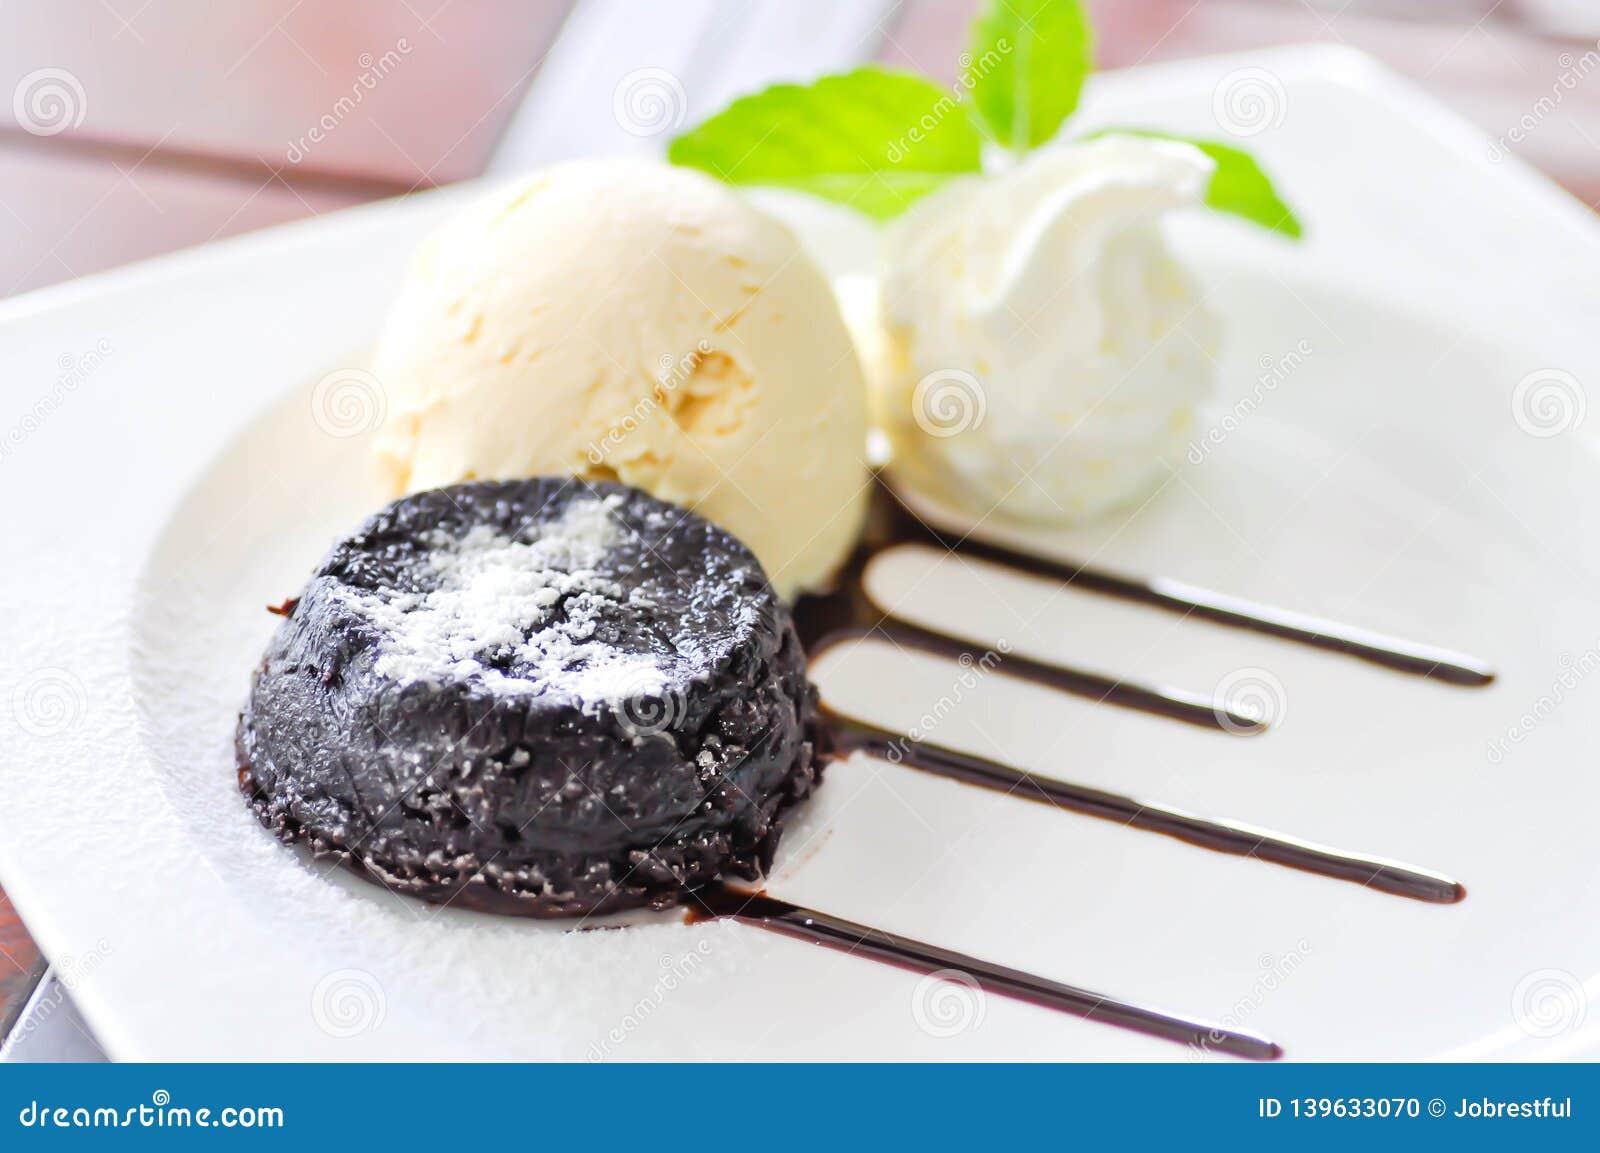 Chocolate cake or chocolate lava cake with ice cream